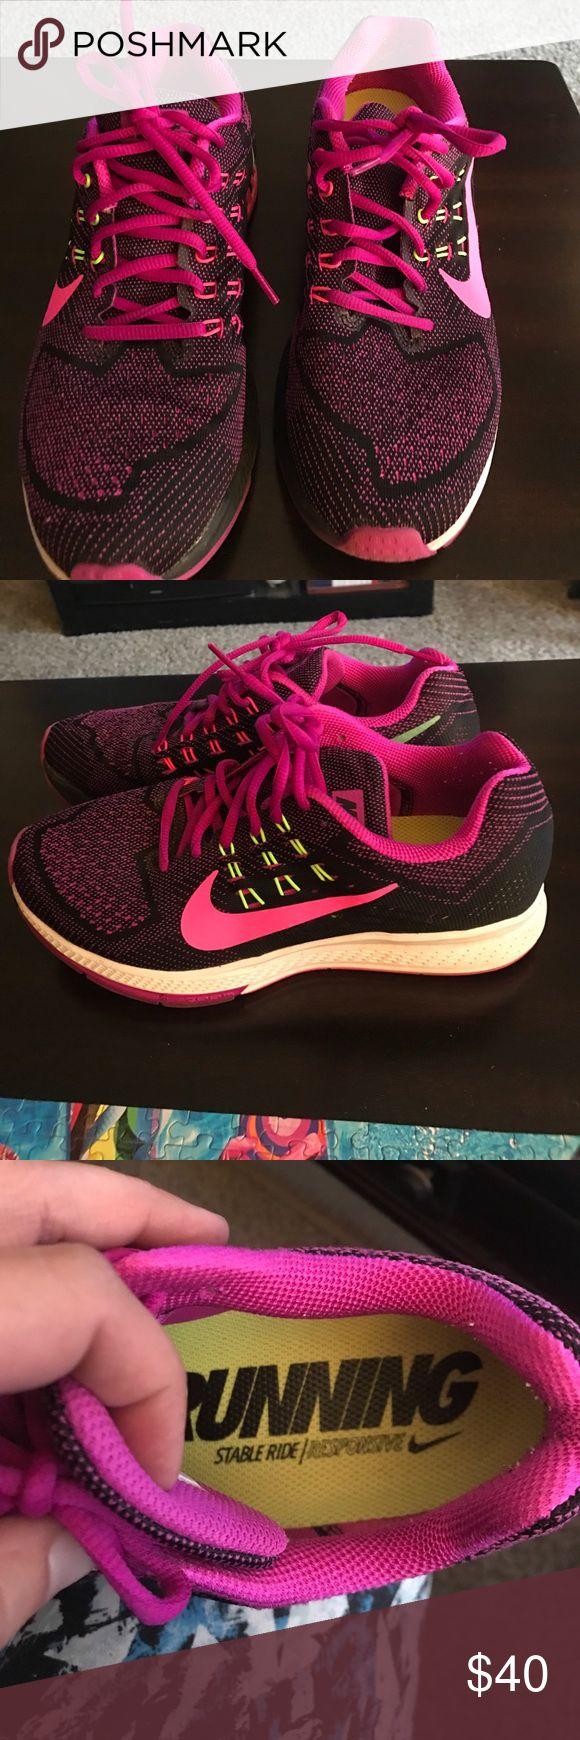 Nike running stride ladies running shoe Ladies Nike running stable ride gym shoe.  Worn 2 times. Ladies size 8.5 Nike Shoes Athletic Shoes